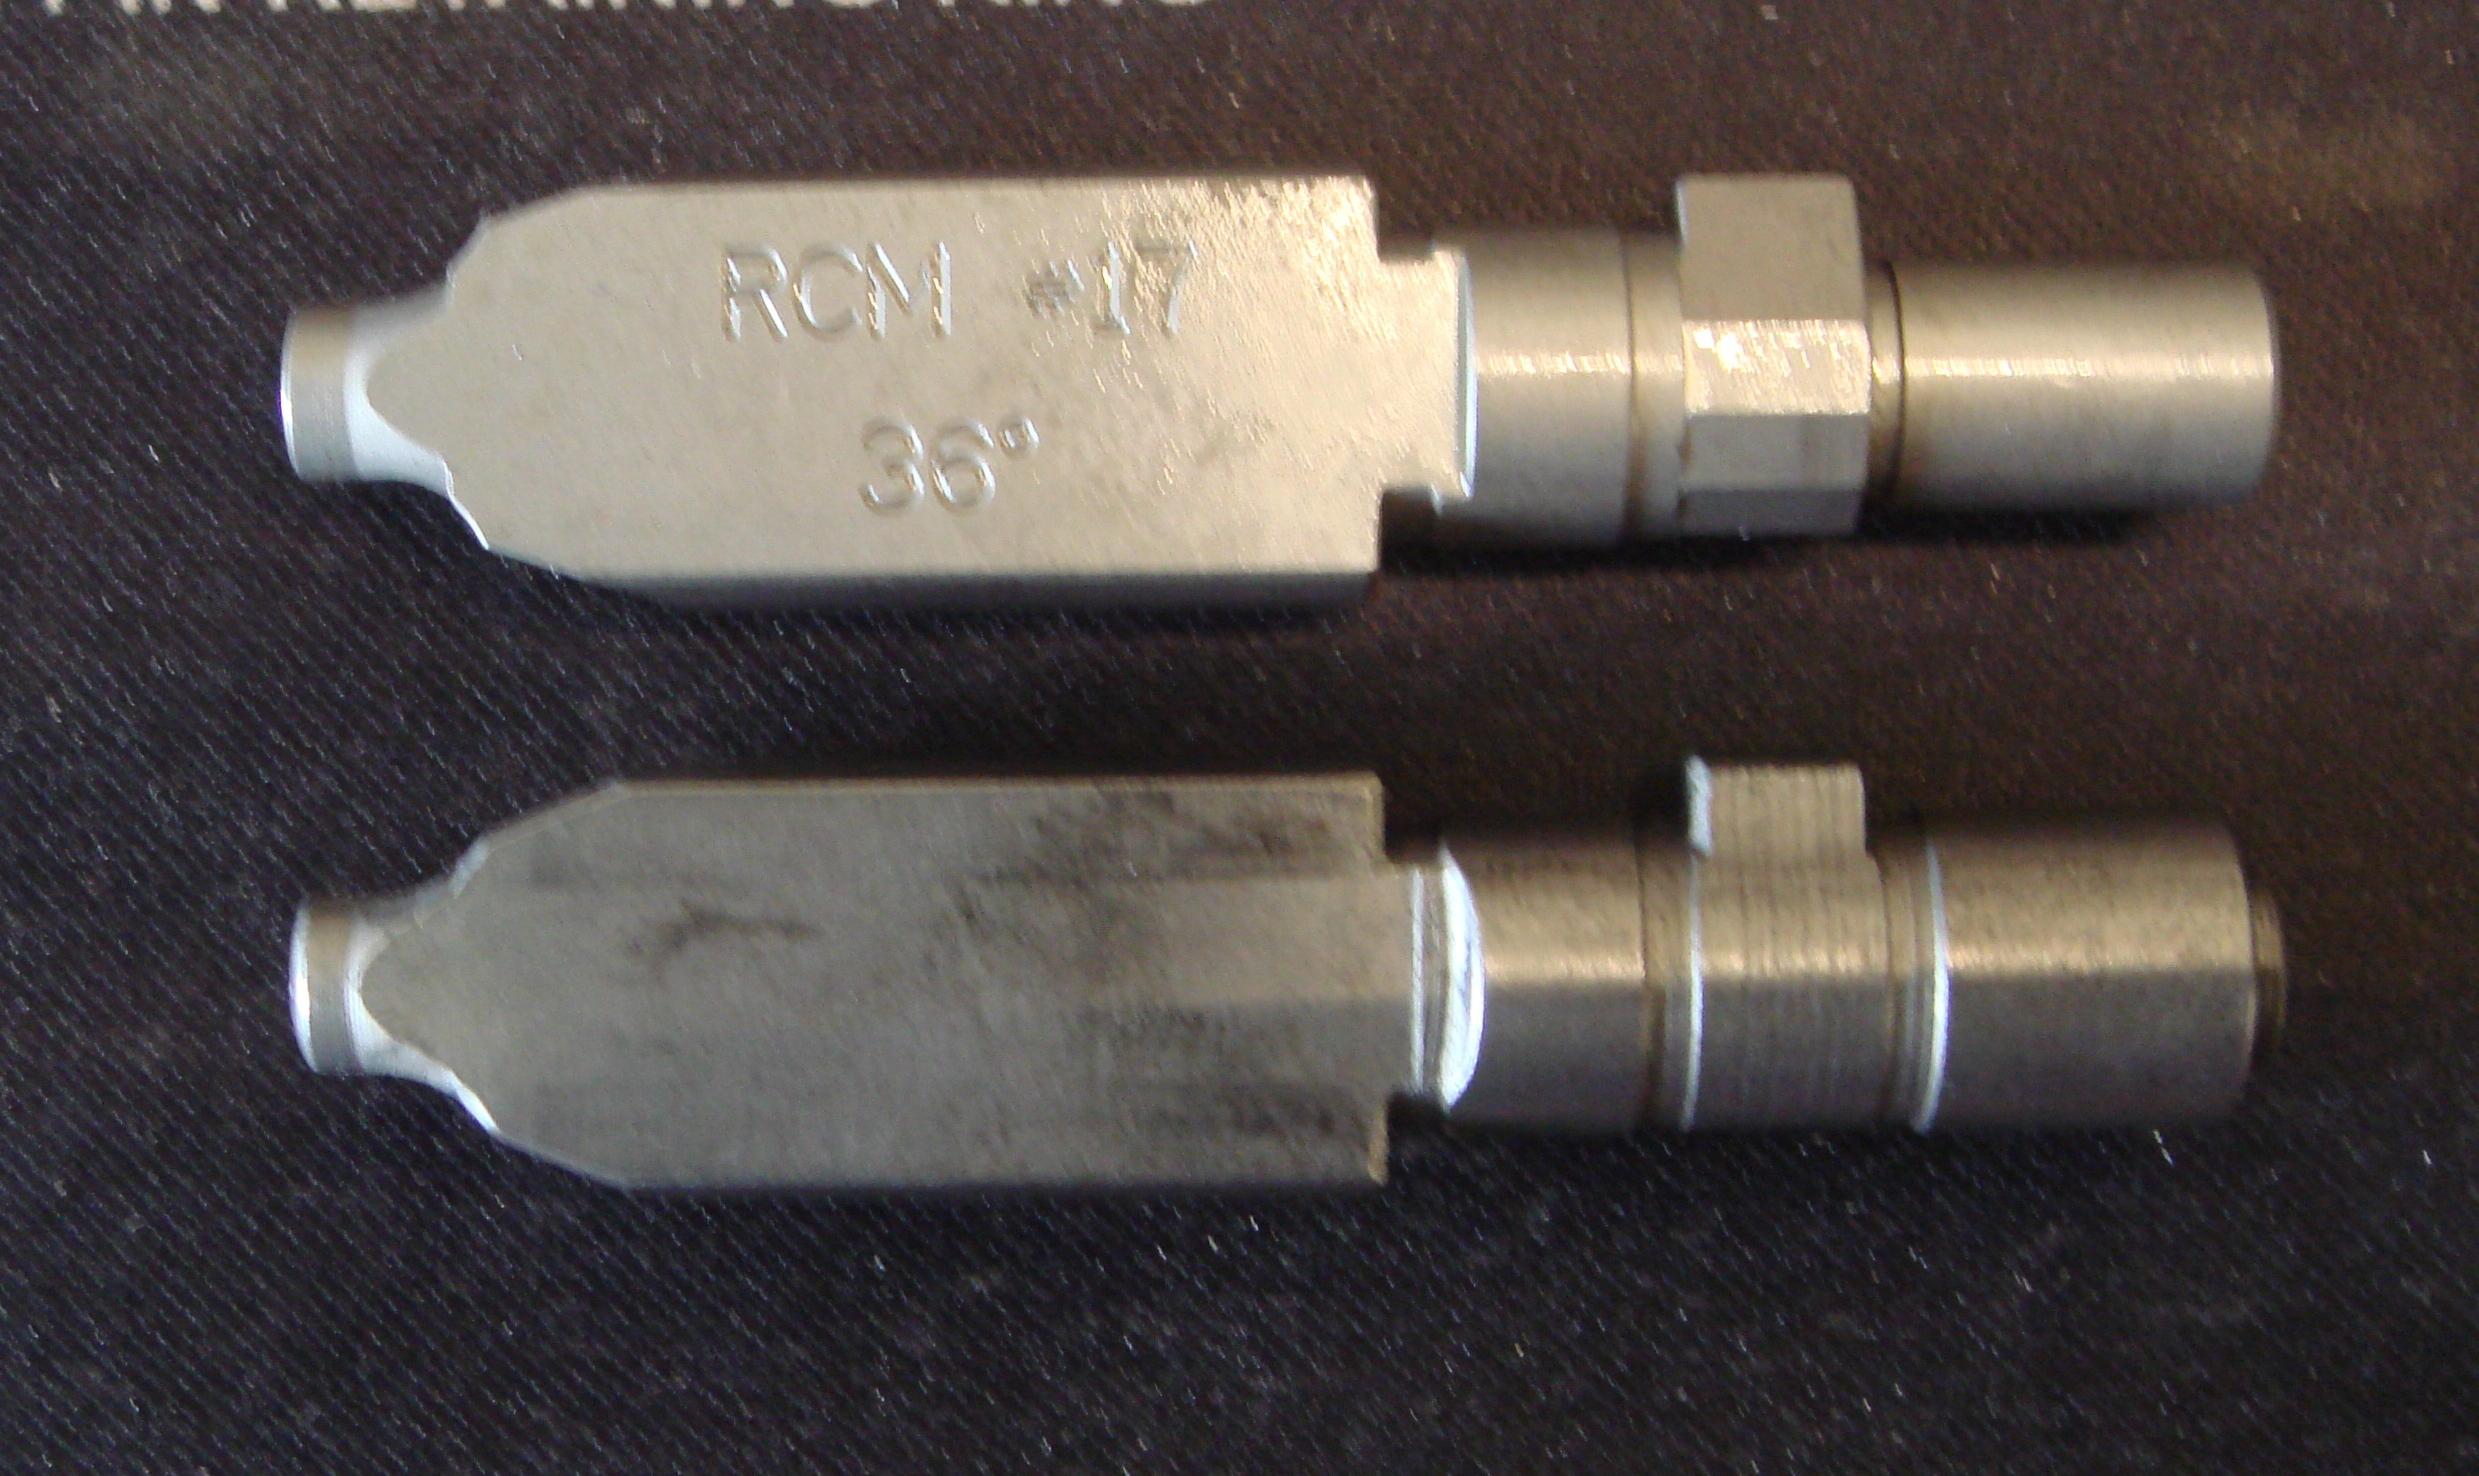 Suppressed HK91/SR-dsc05511.jpg